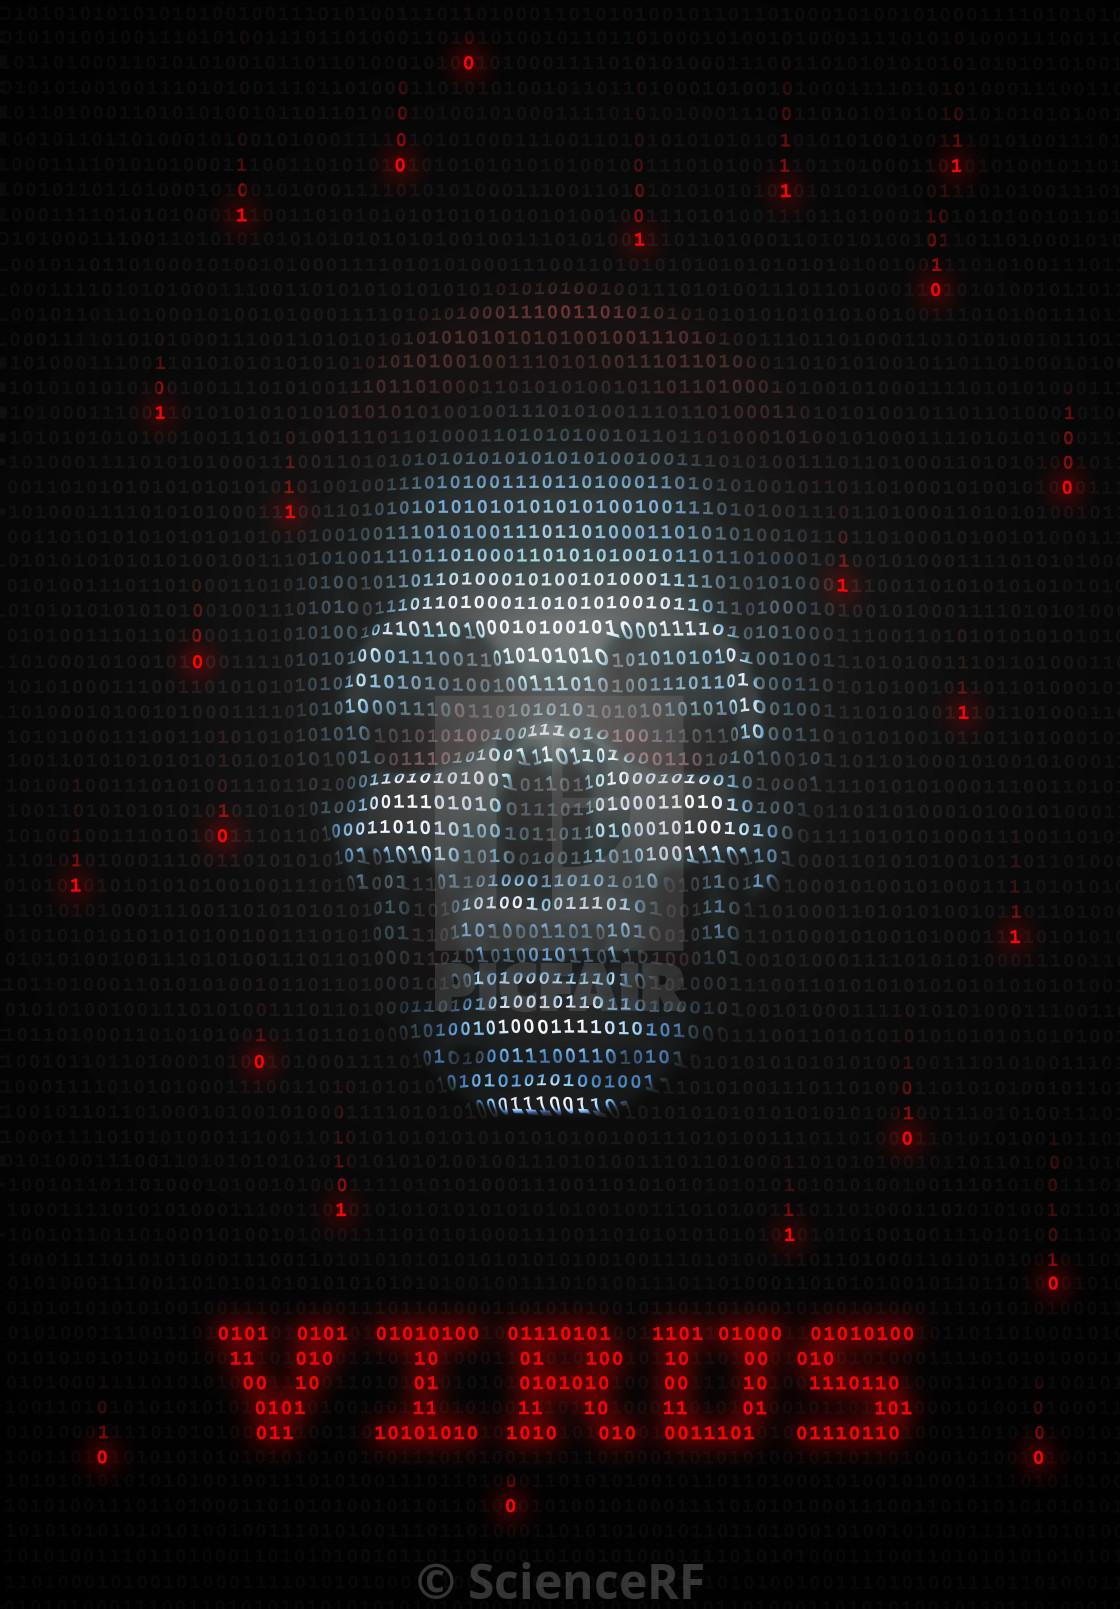 Illustration of Computer Virus or Trojan - License, download or